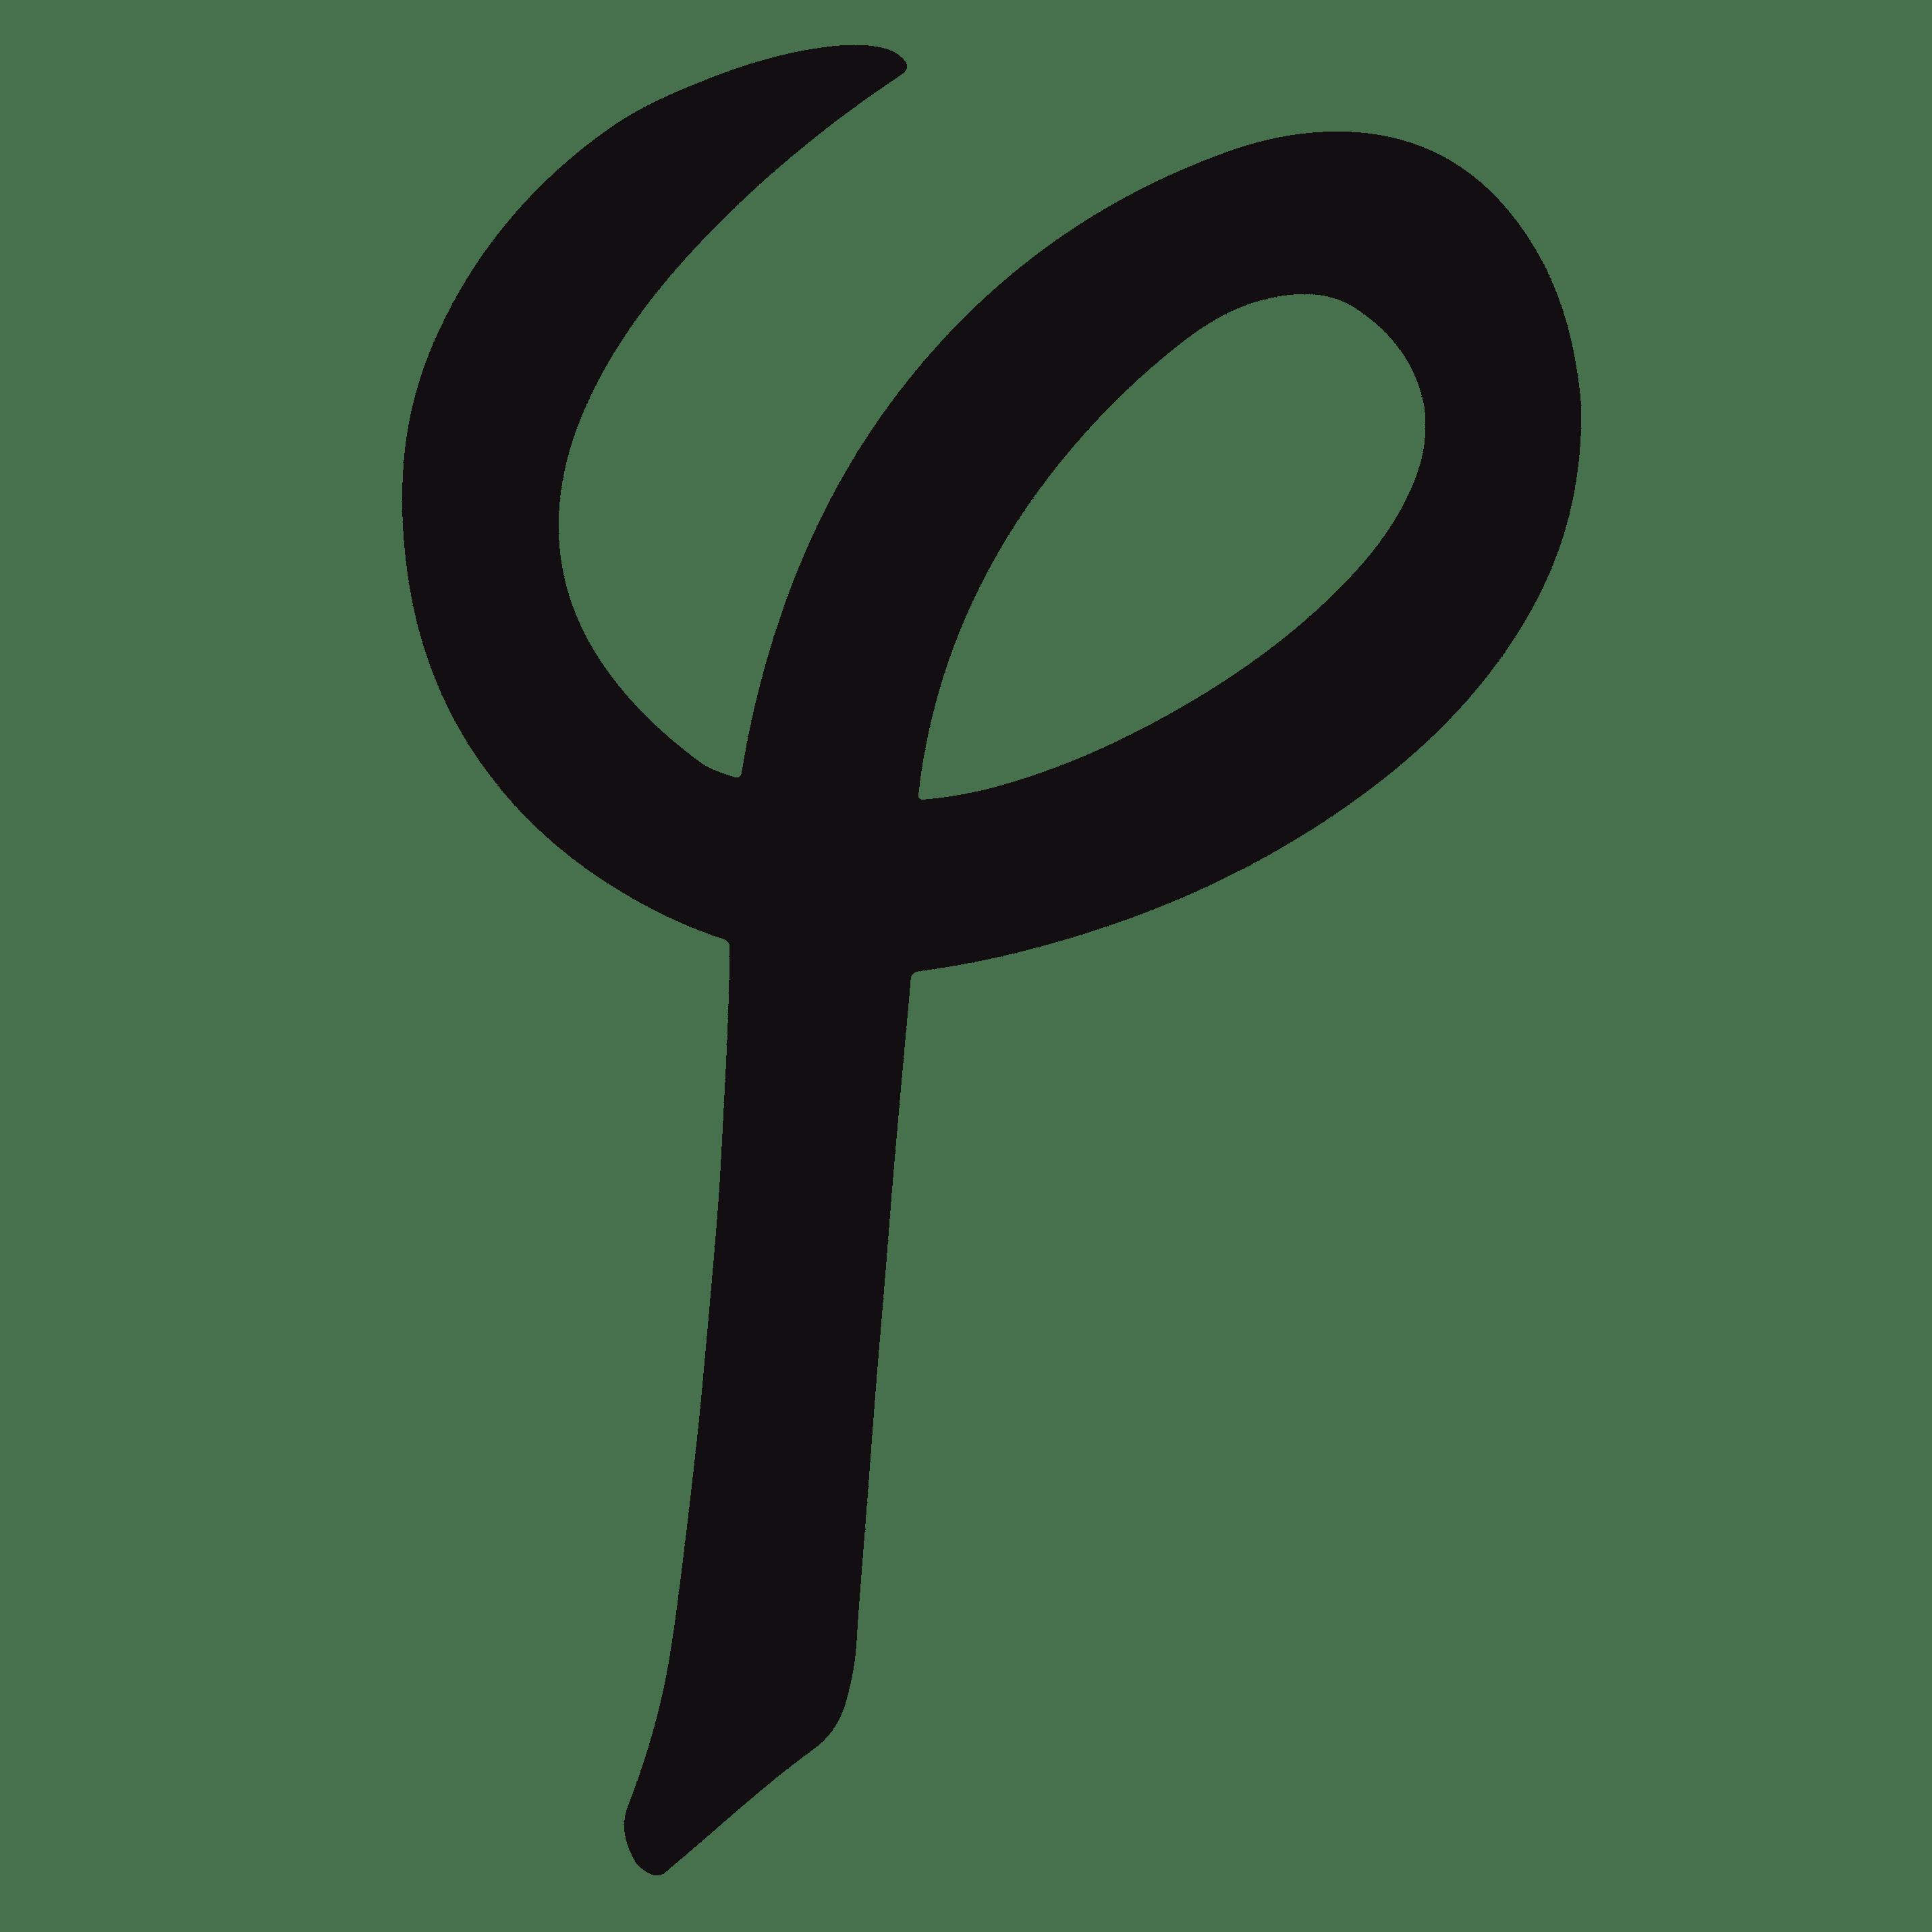 PHIGUITARS